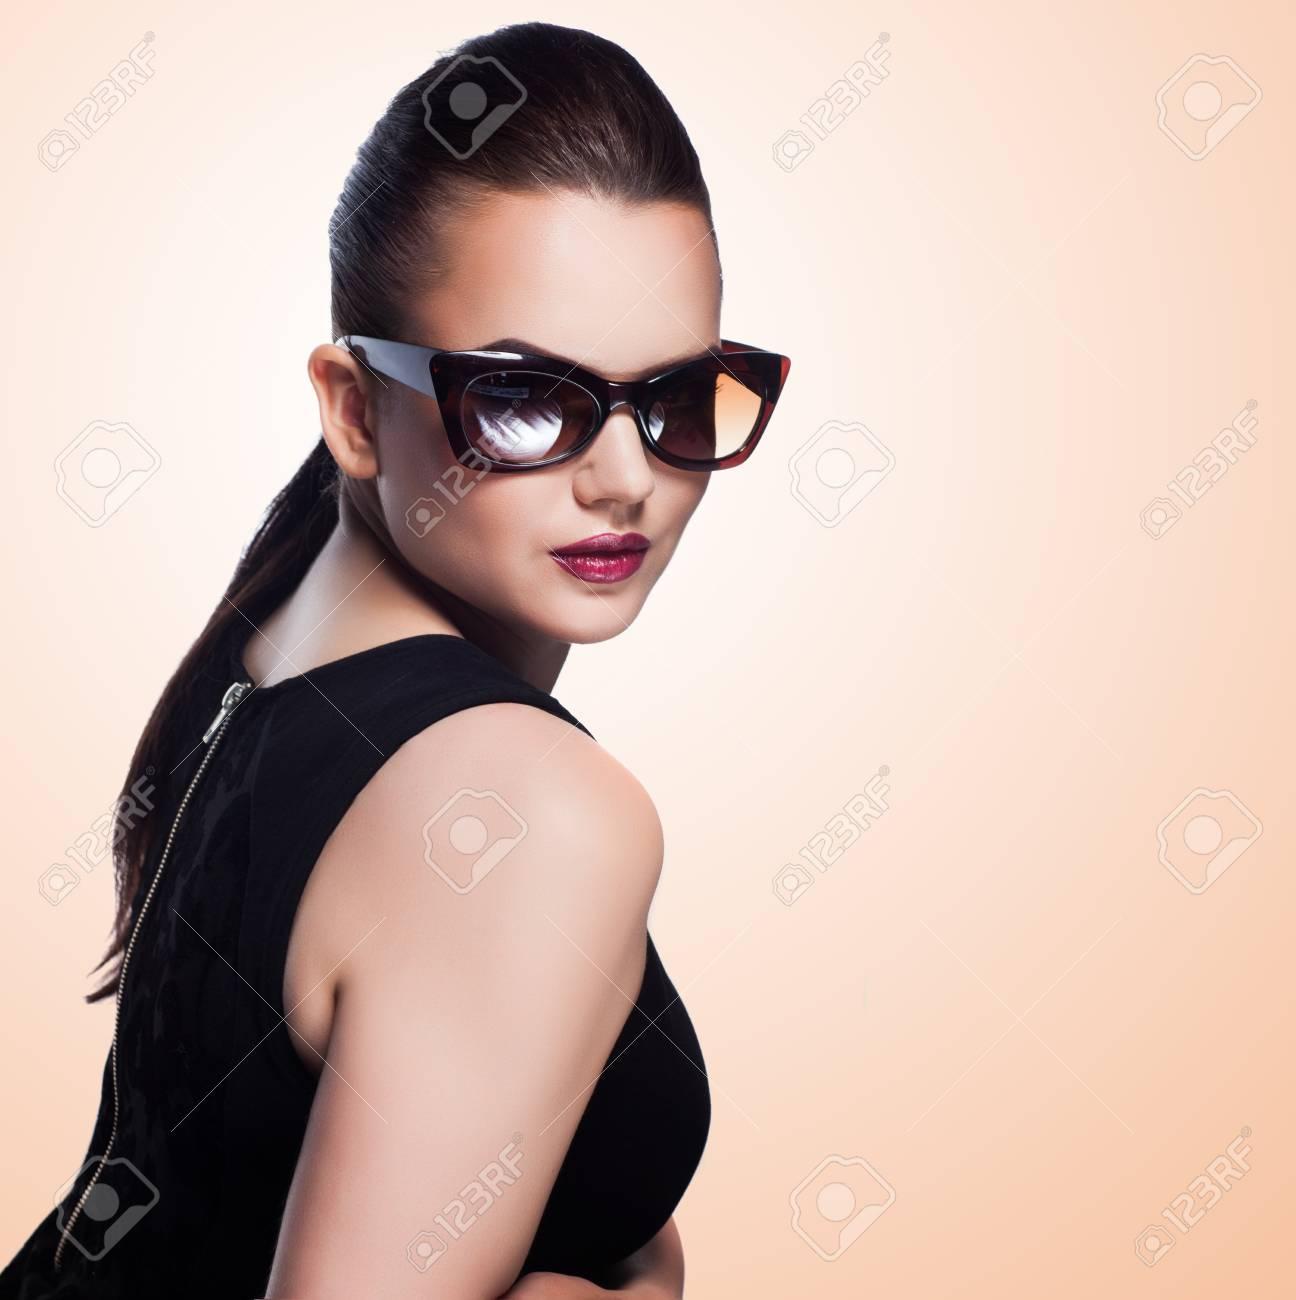 close-up portrait of beautiful and fashion girl in sunglasses, studio shot Stock Photo - 20667938